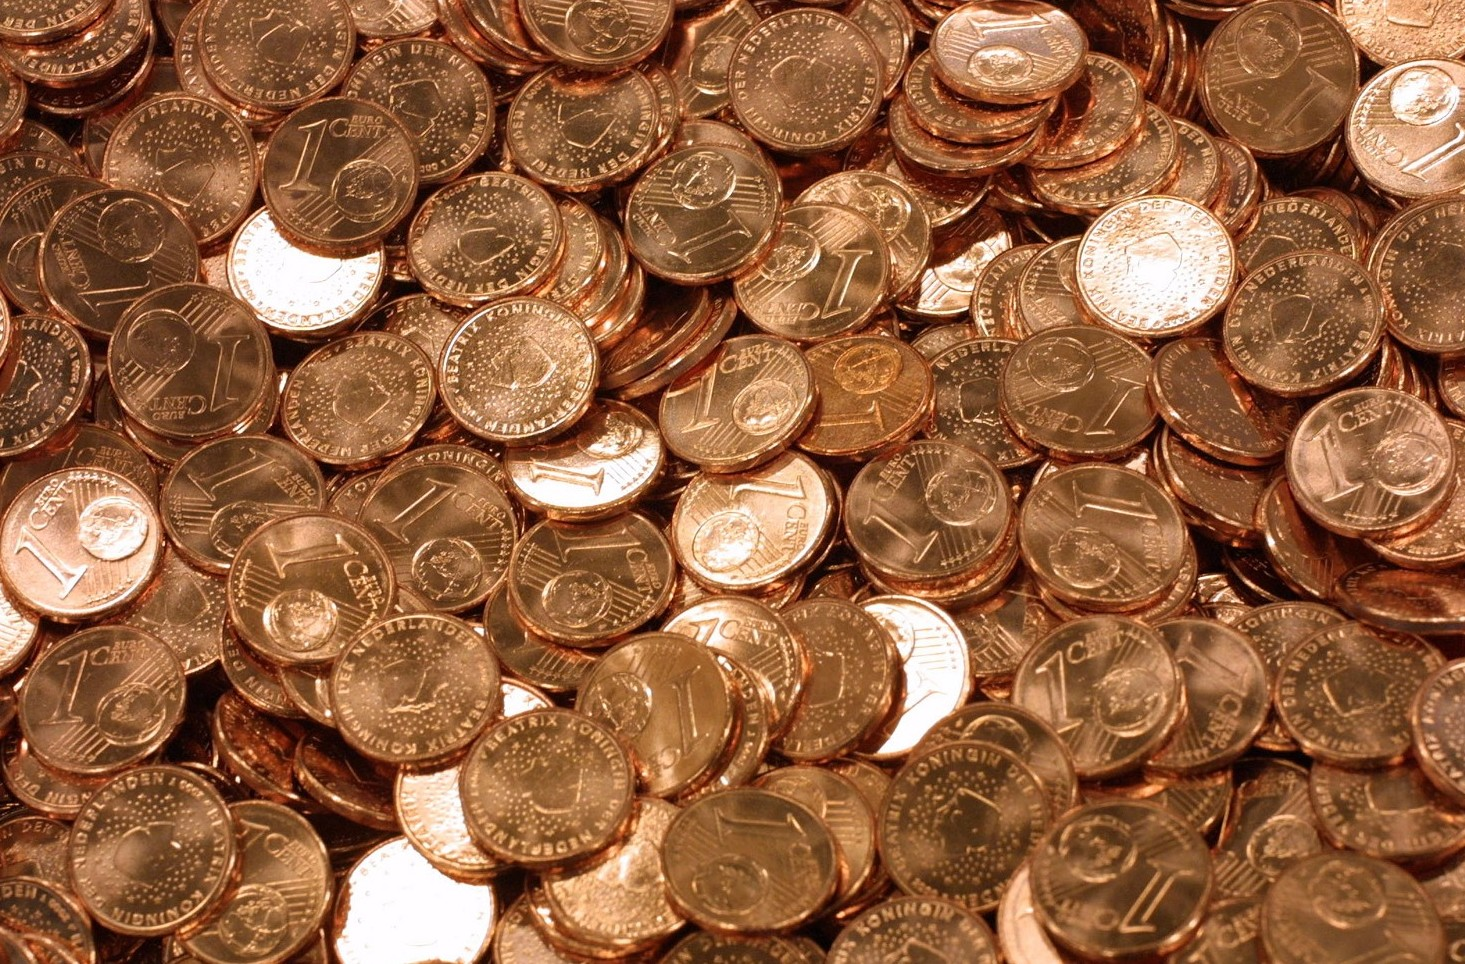 Monete da 1-2 centesimi mancano. Aumento